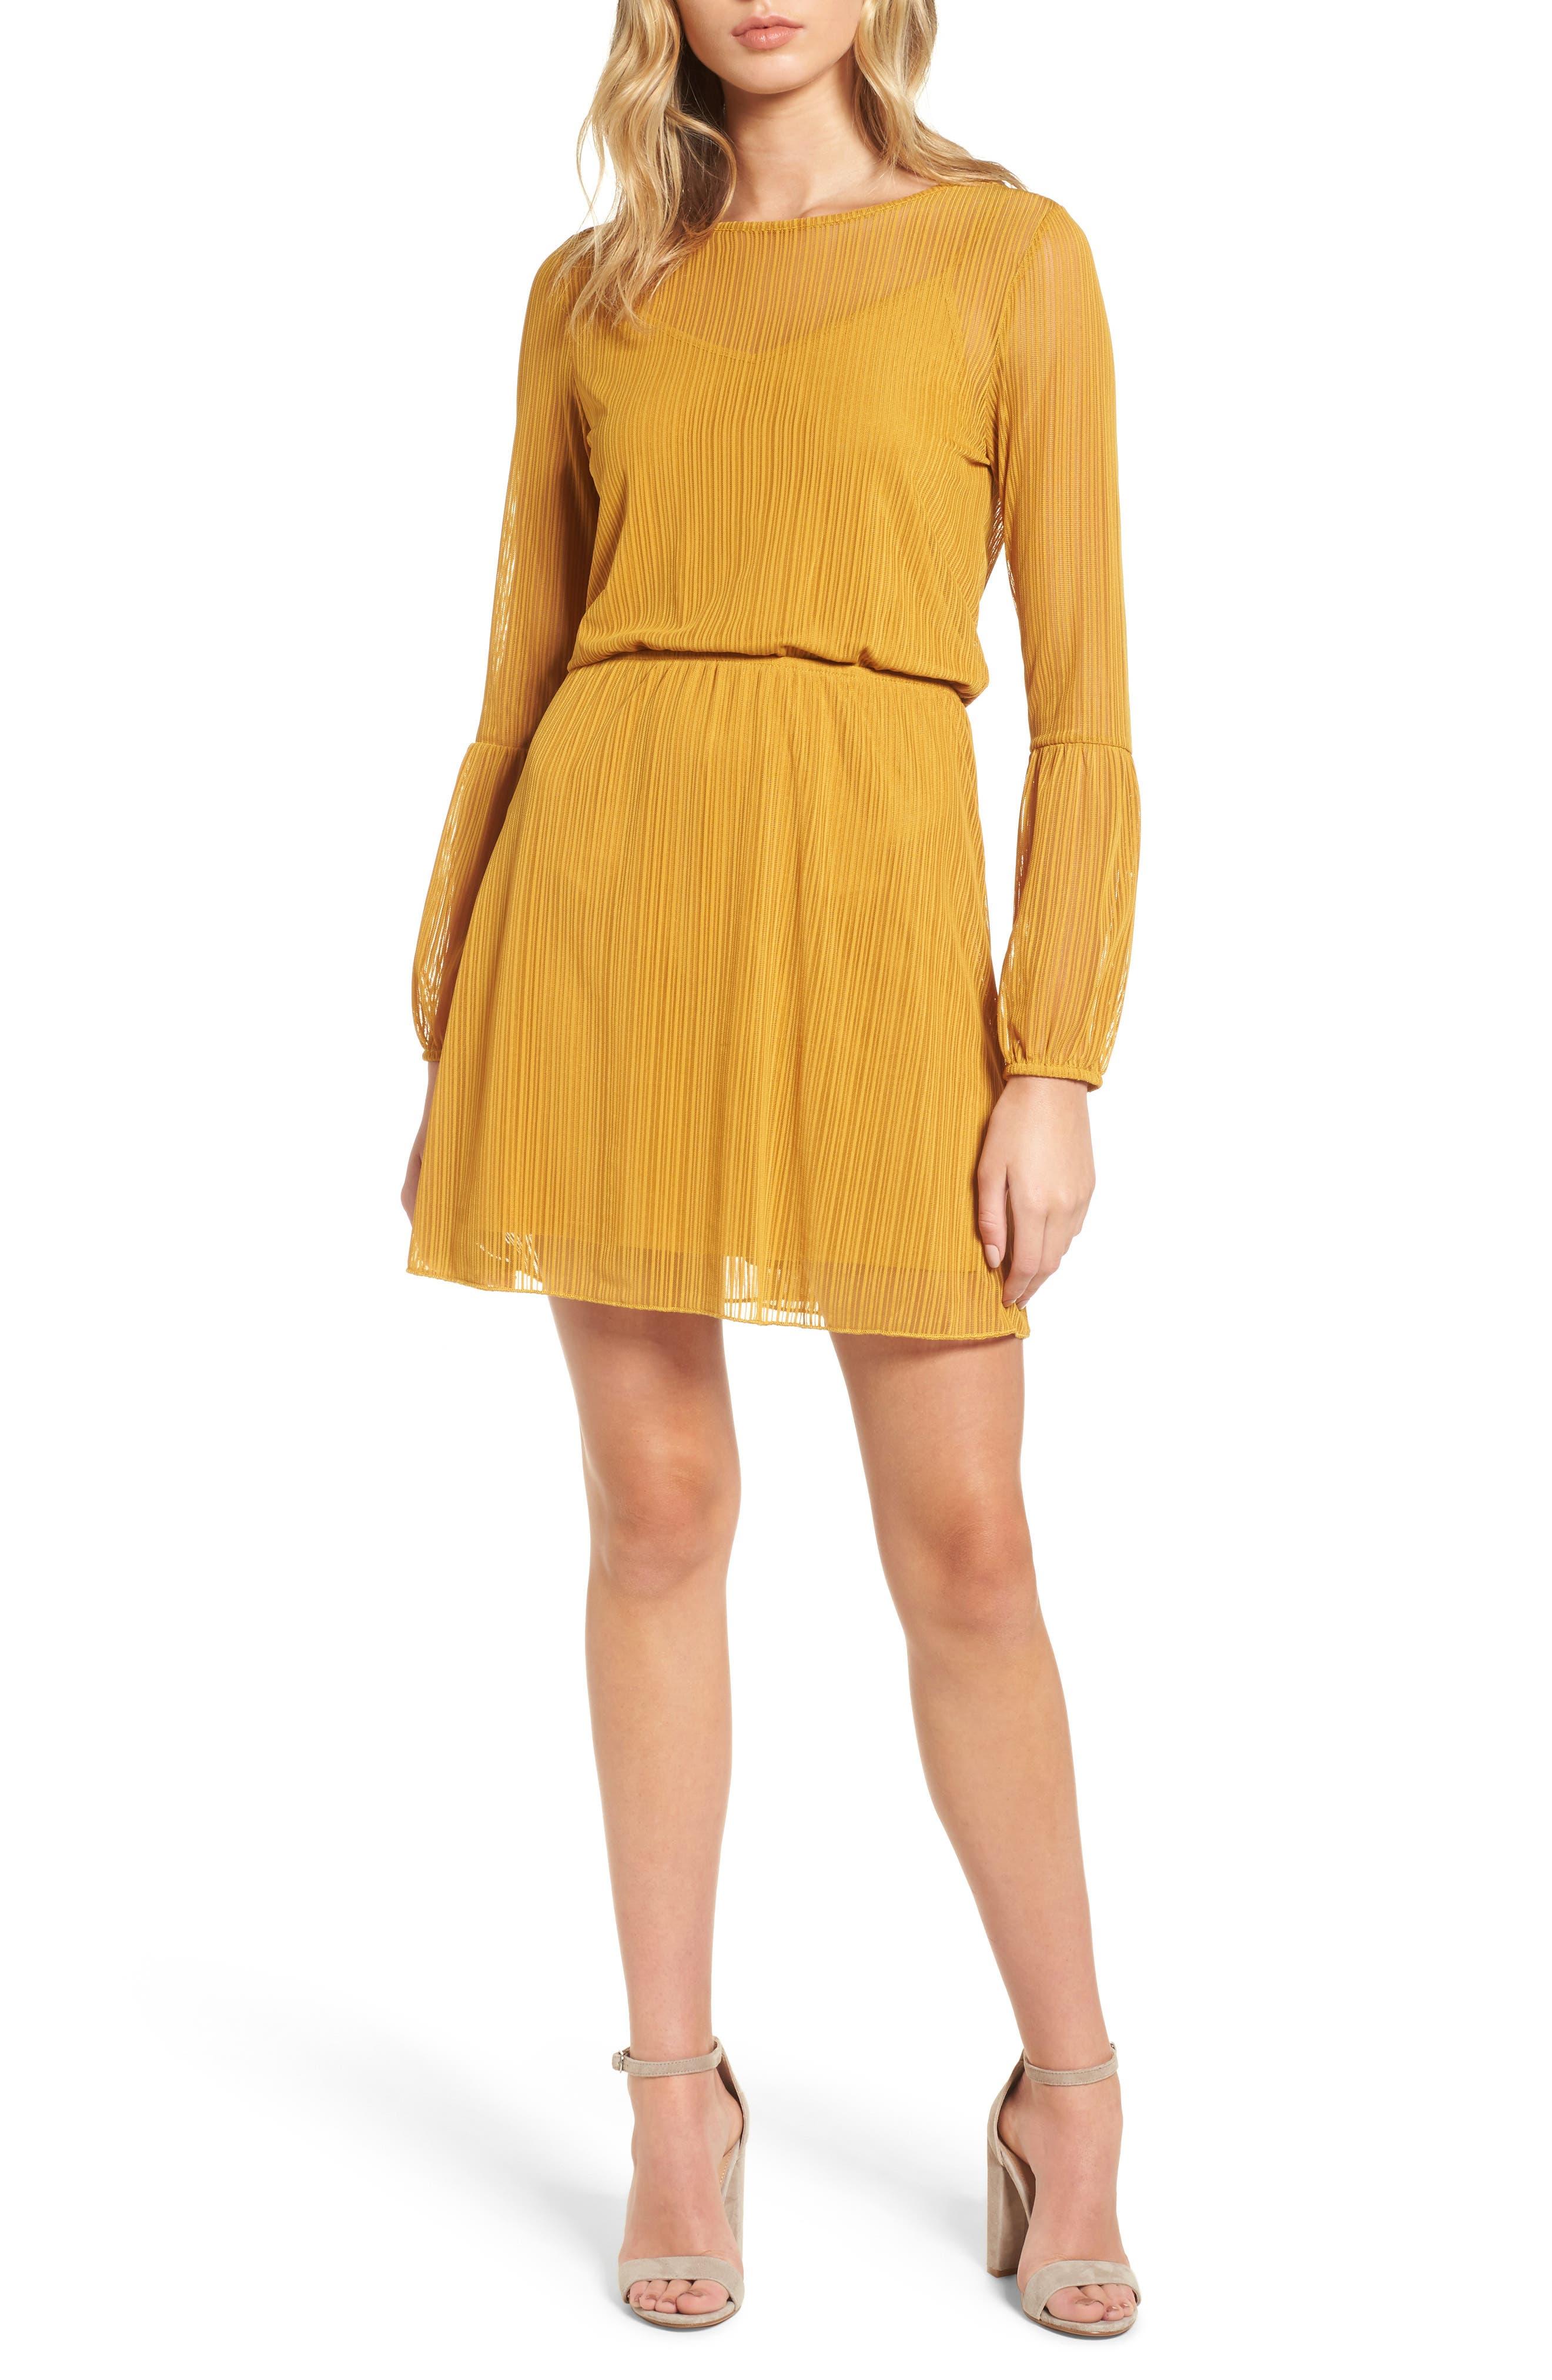 Alternate Image 1 Selected - Leith Blouson Dress